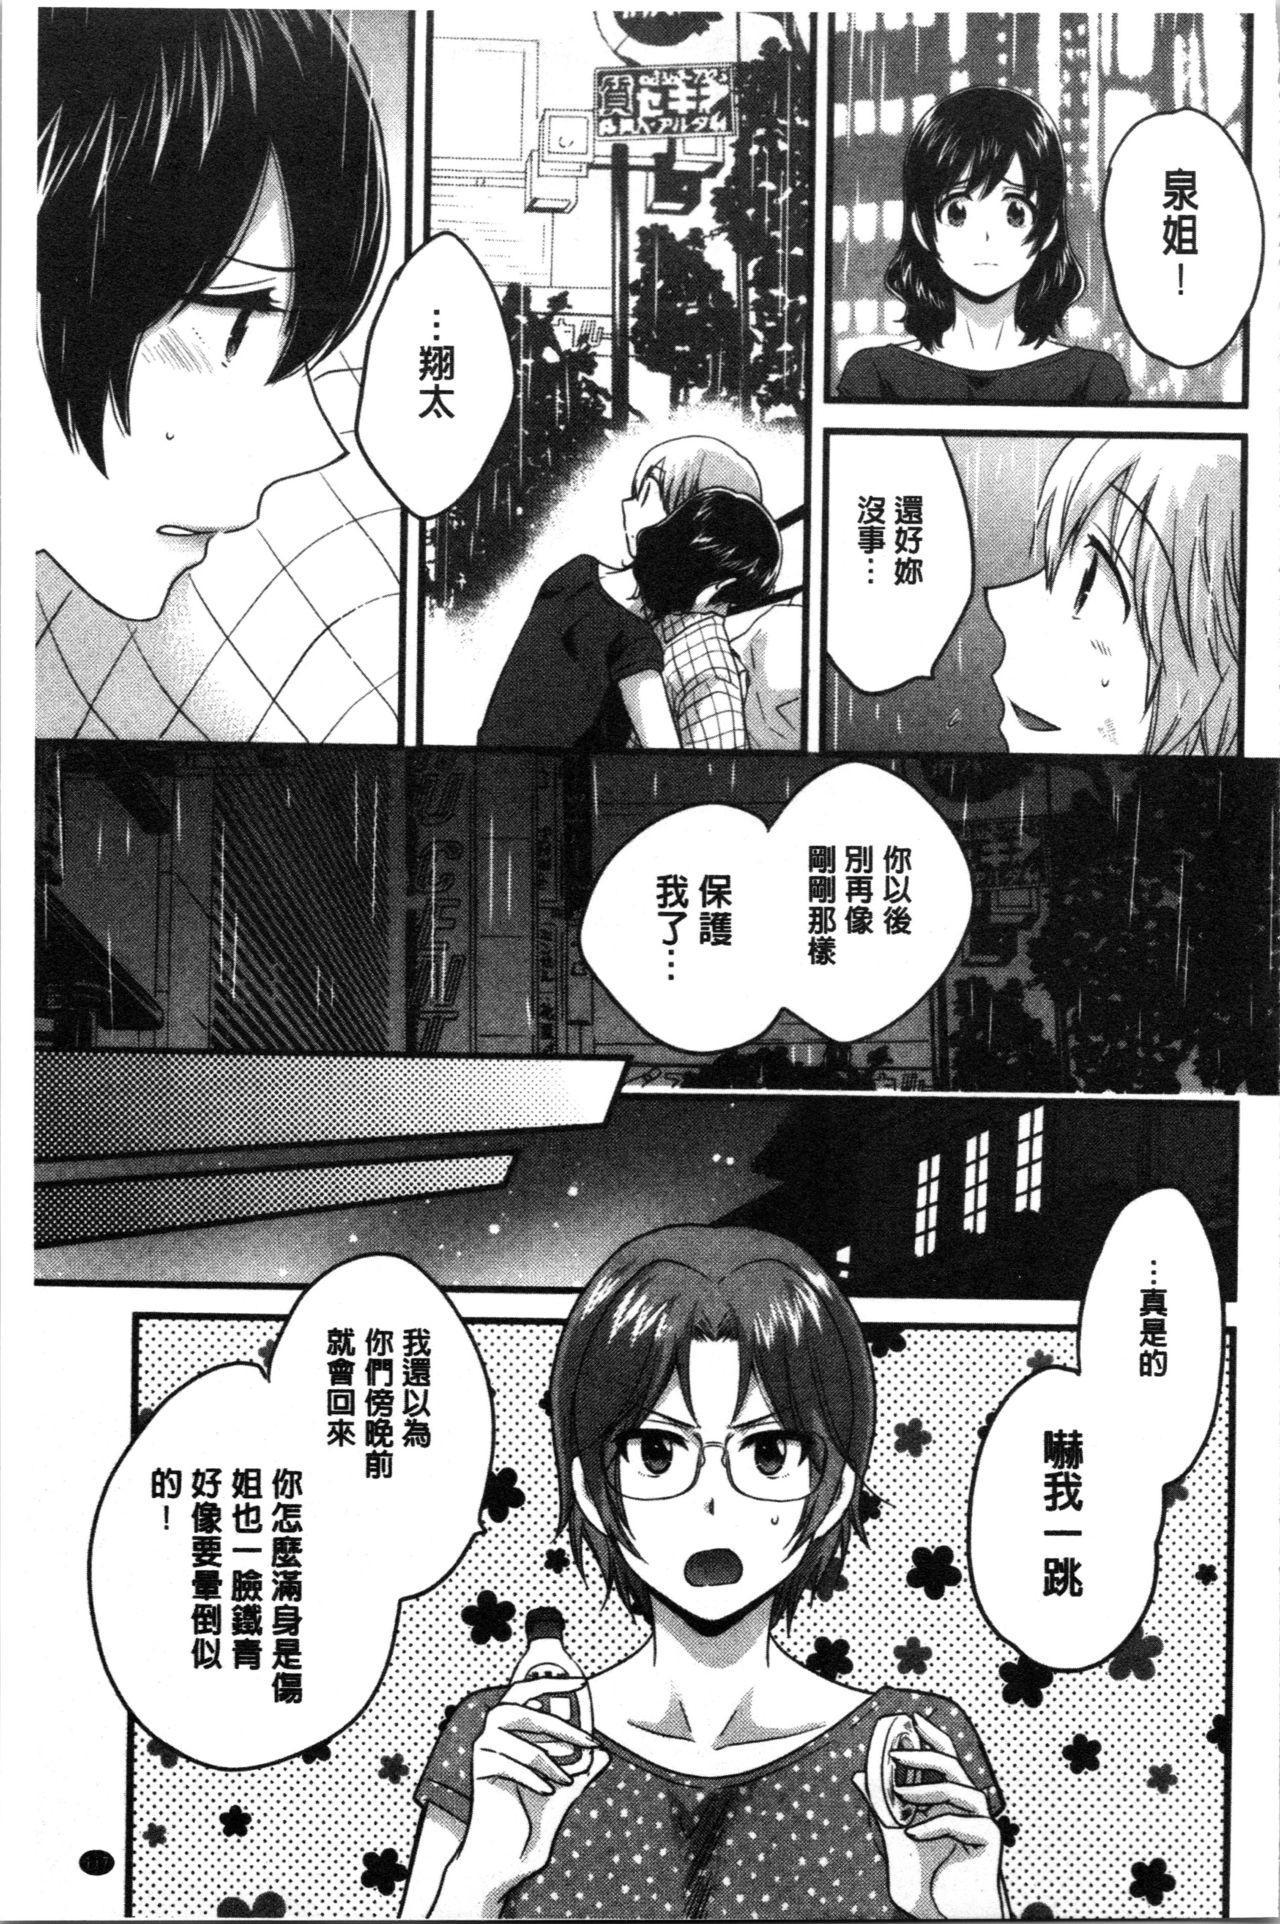 Ottori Midarana Mikami-san   嫻淑優雅又淫亂的三上小姐 118